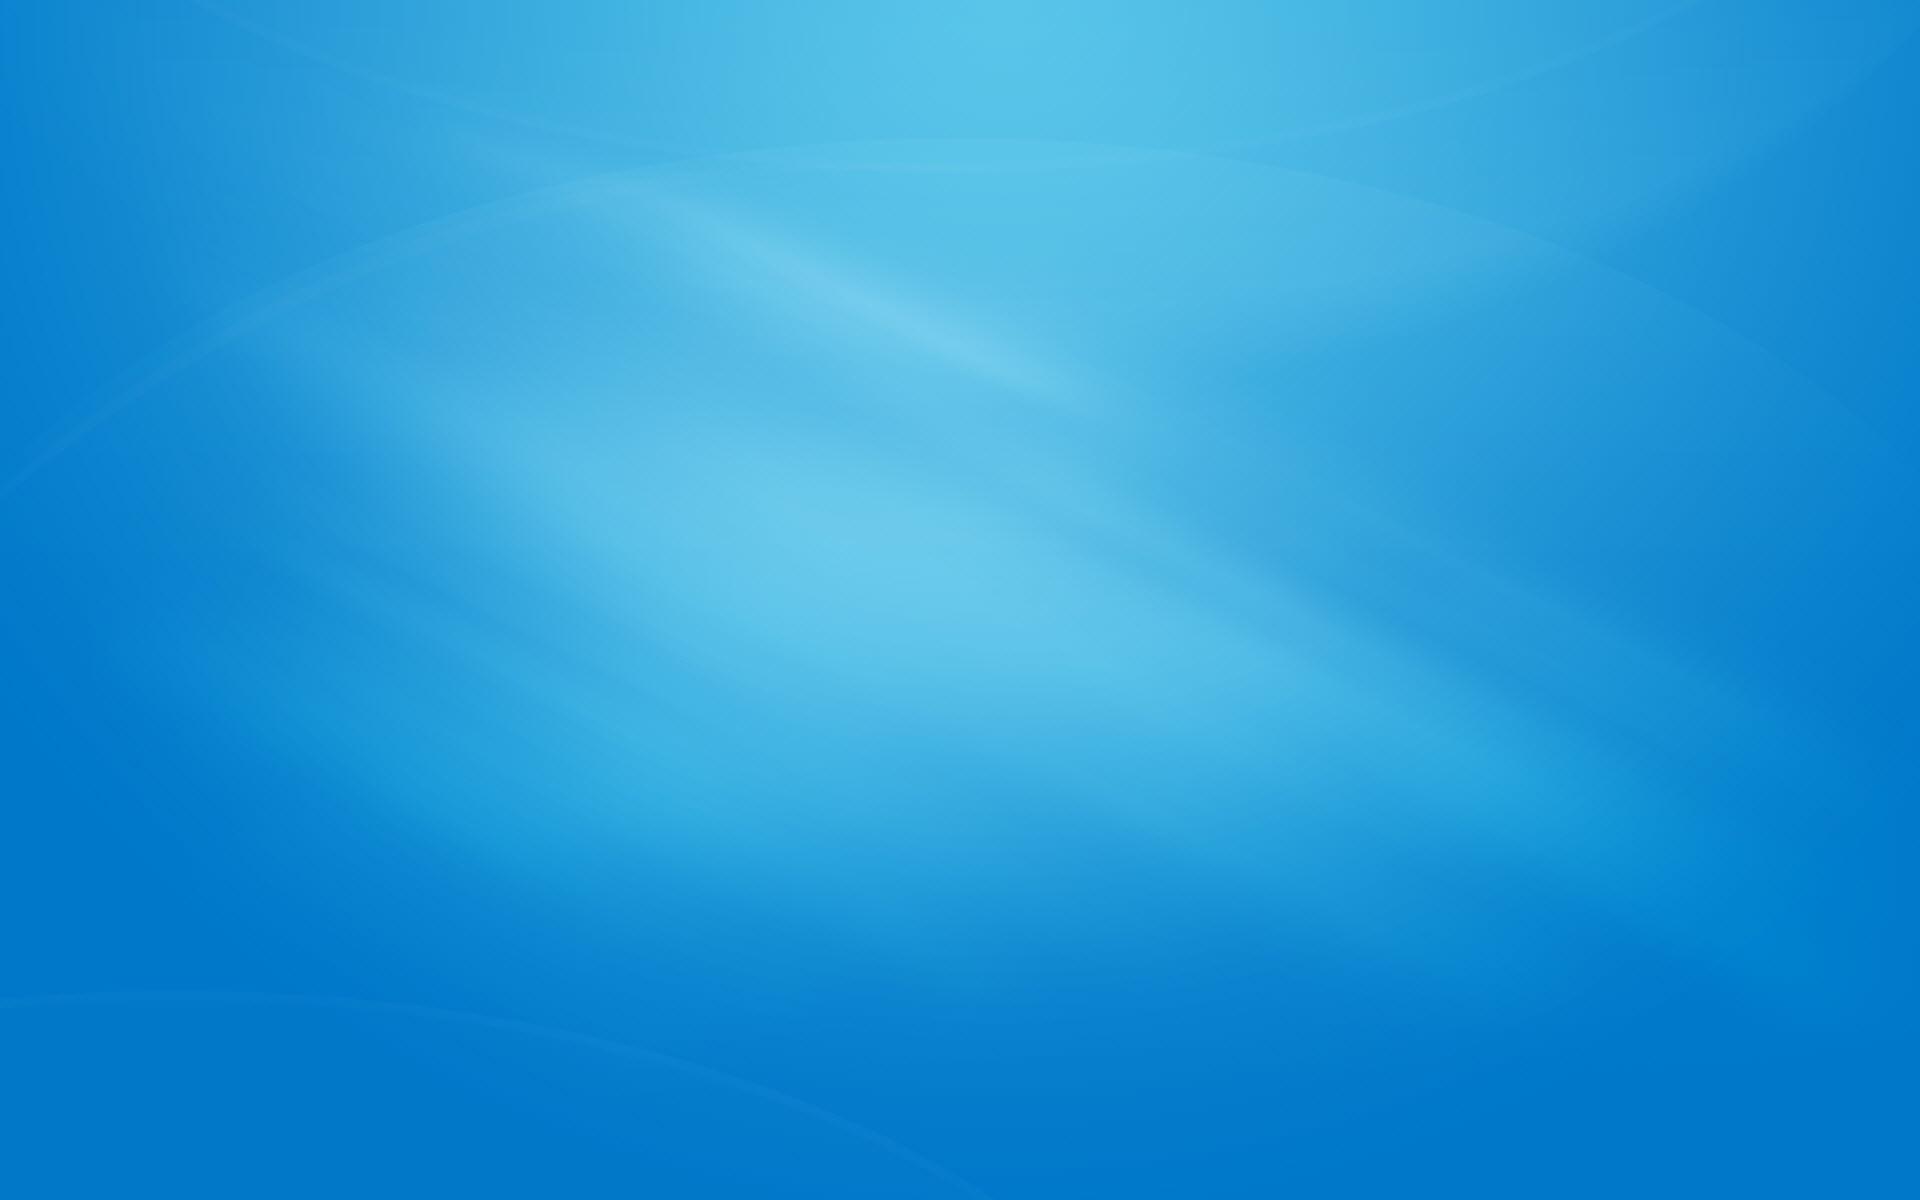 Hd Desktop Blue Wallpapers In Jpg Format For Free Download